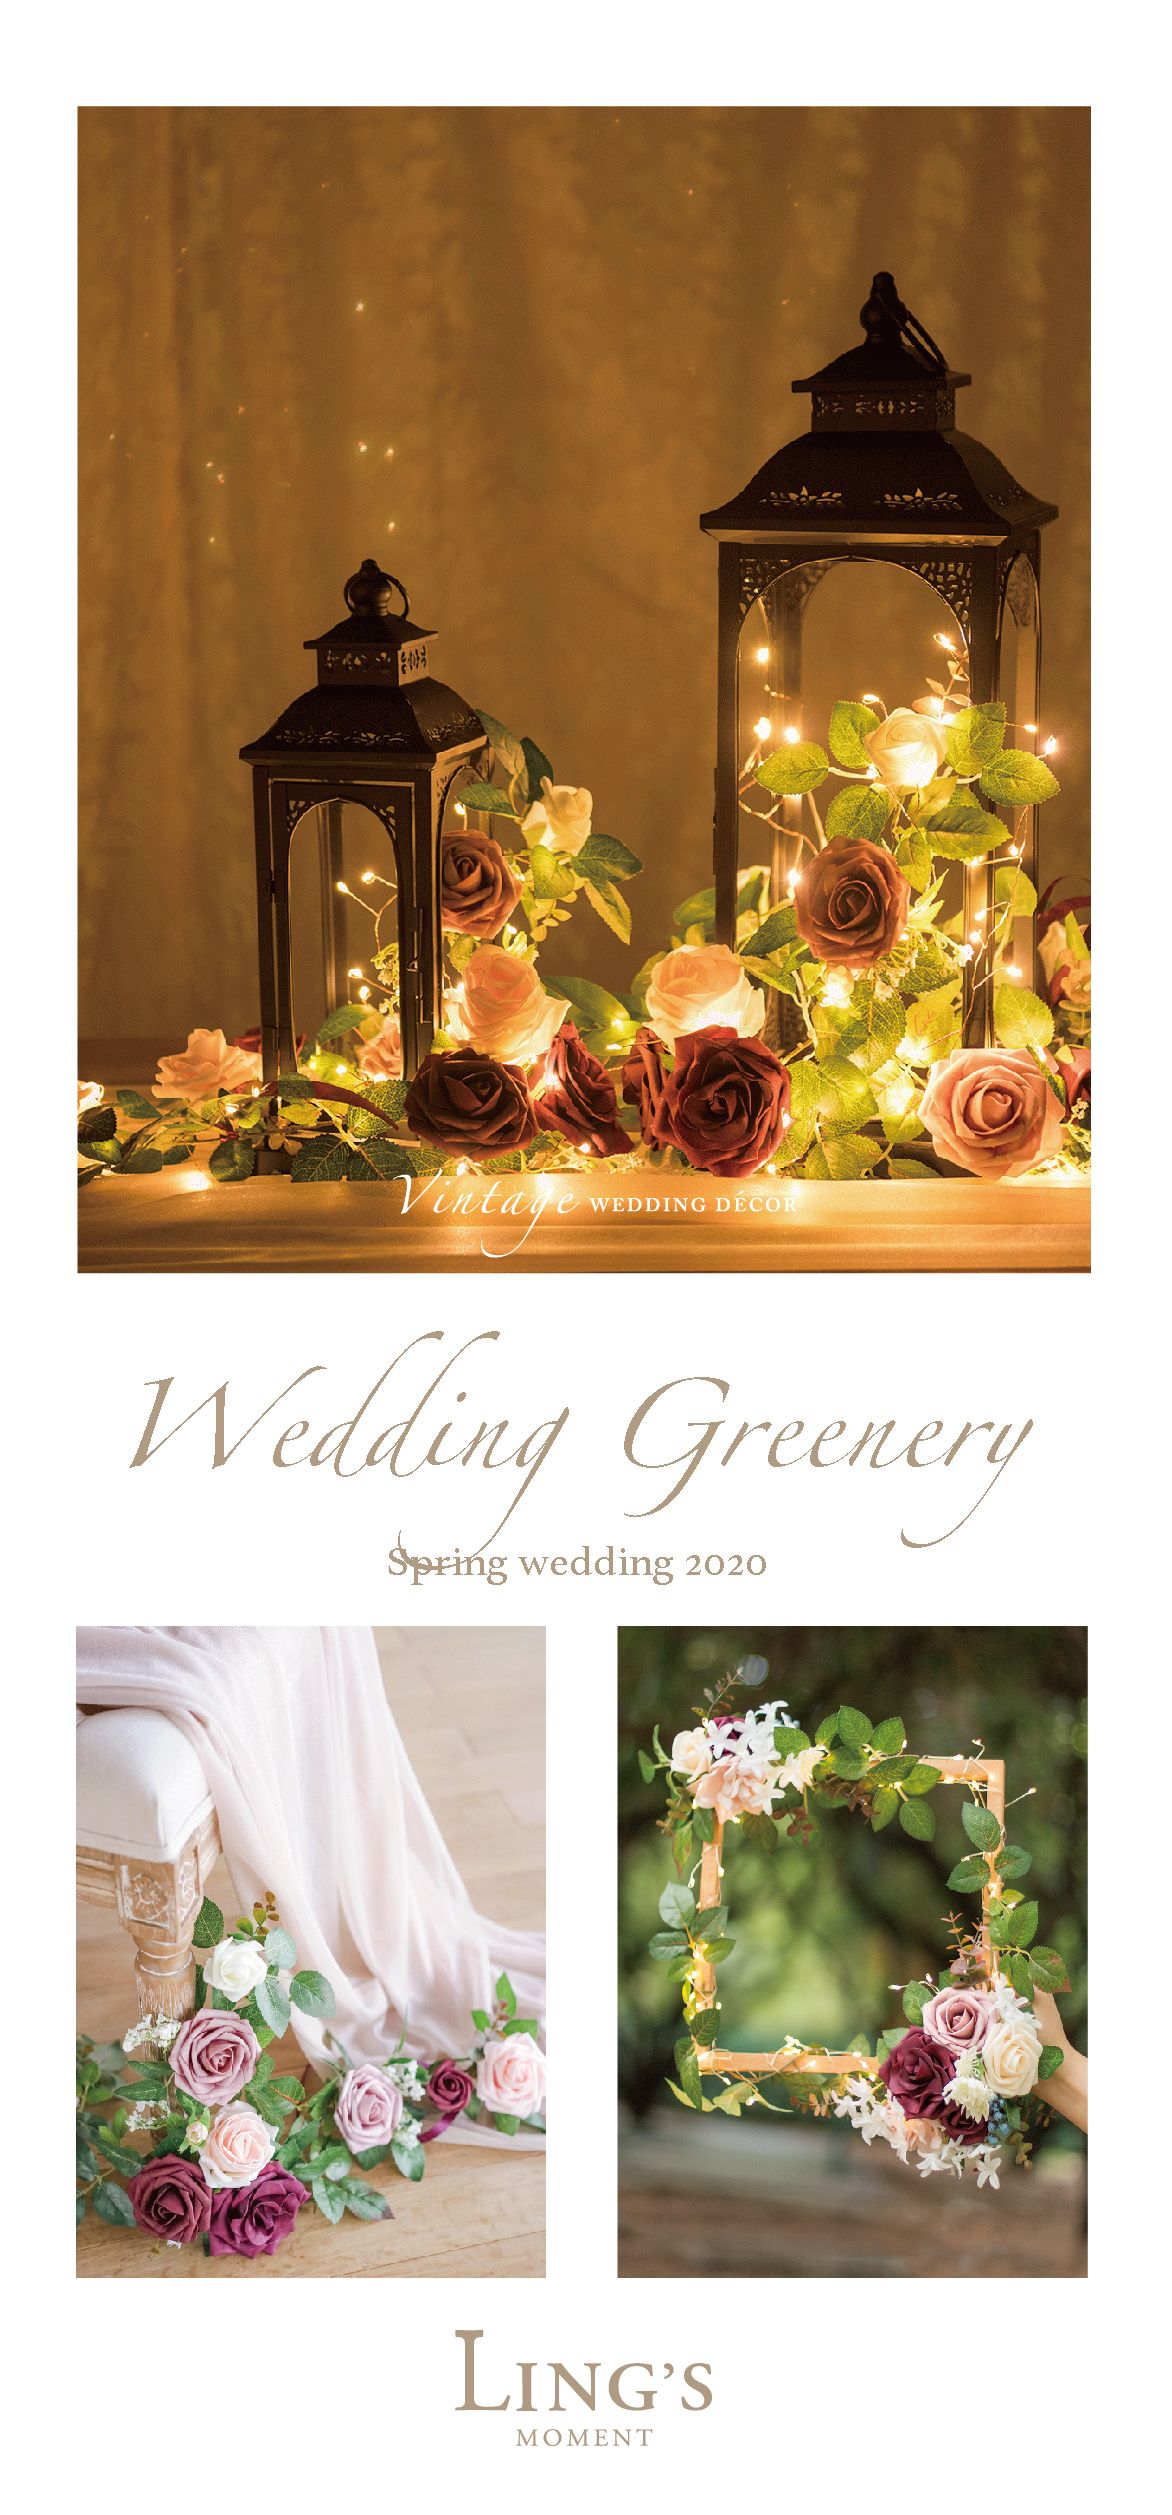 Flower Garlands Rustic Wedding More Wedding Supplies 10 Off Rustic Wedding Flowers Diy Wedding Decorations Wedding Decorations